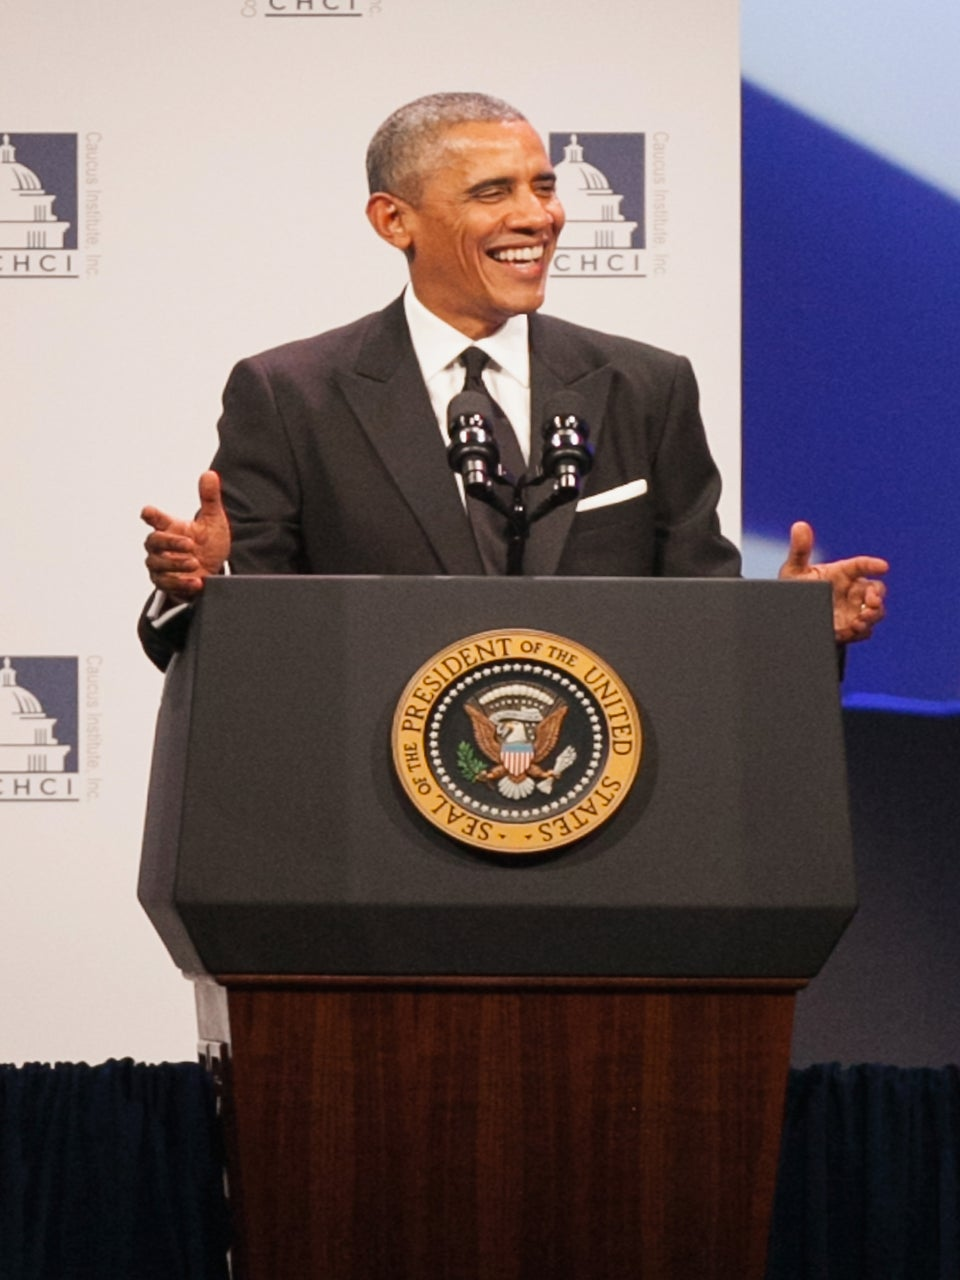 President Obama Gives Kanye West Advice About Politics